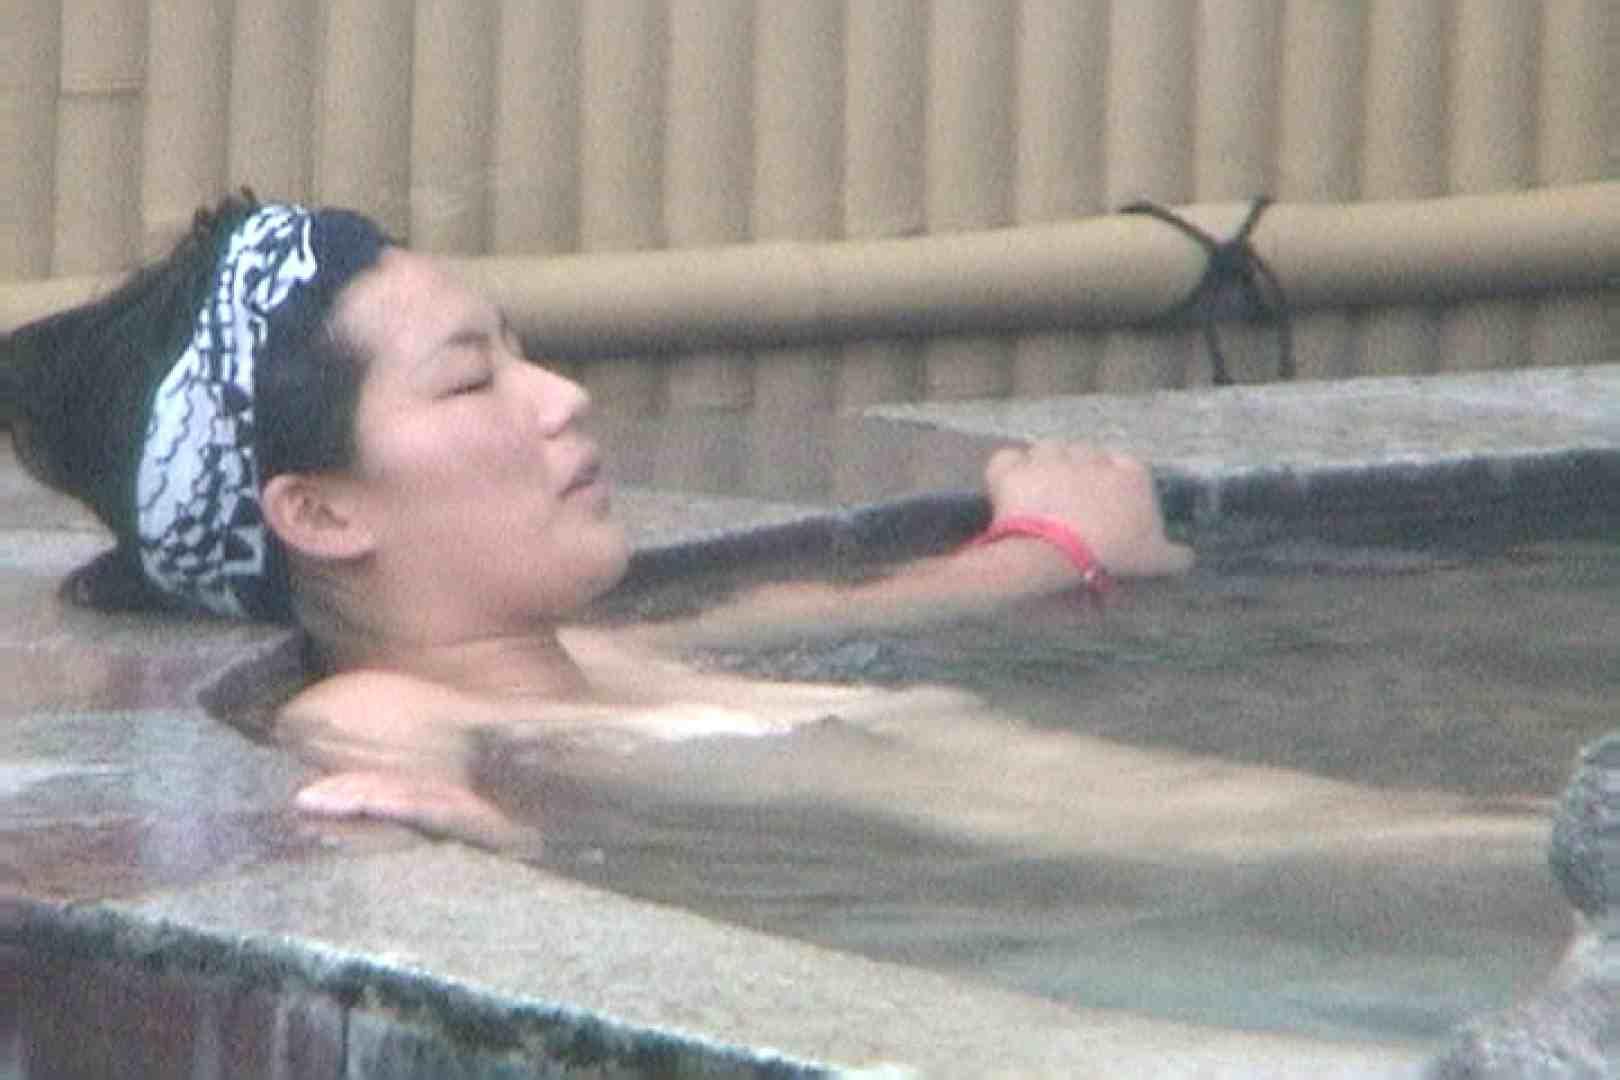 Aquaな露天風呂Vol.103 盗撮シリーズ | 露天風呂編  94PIX 3